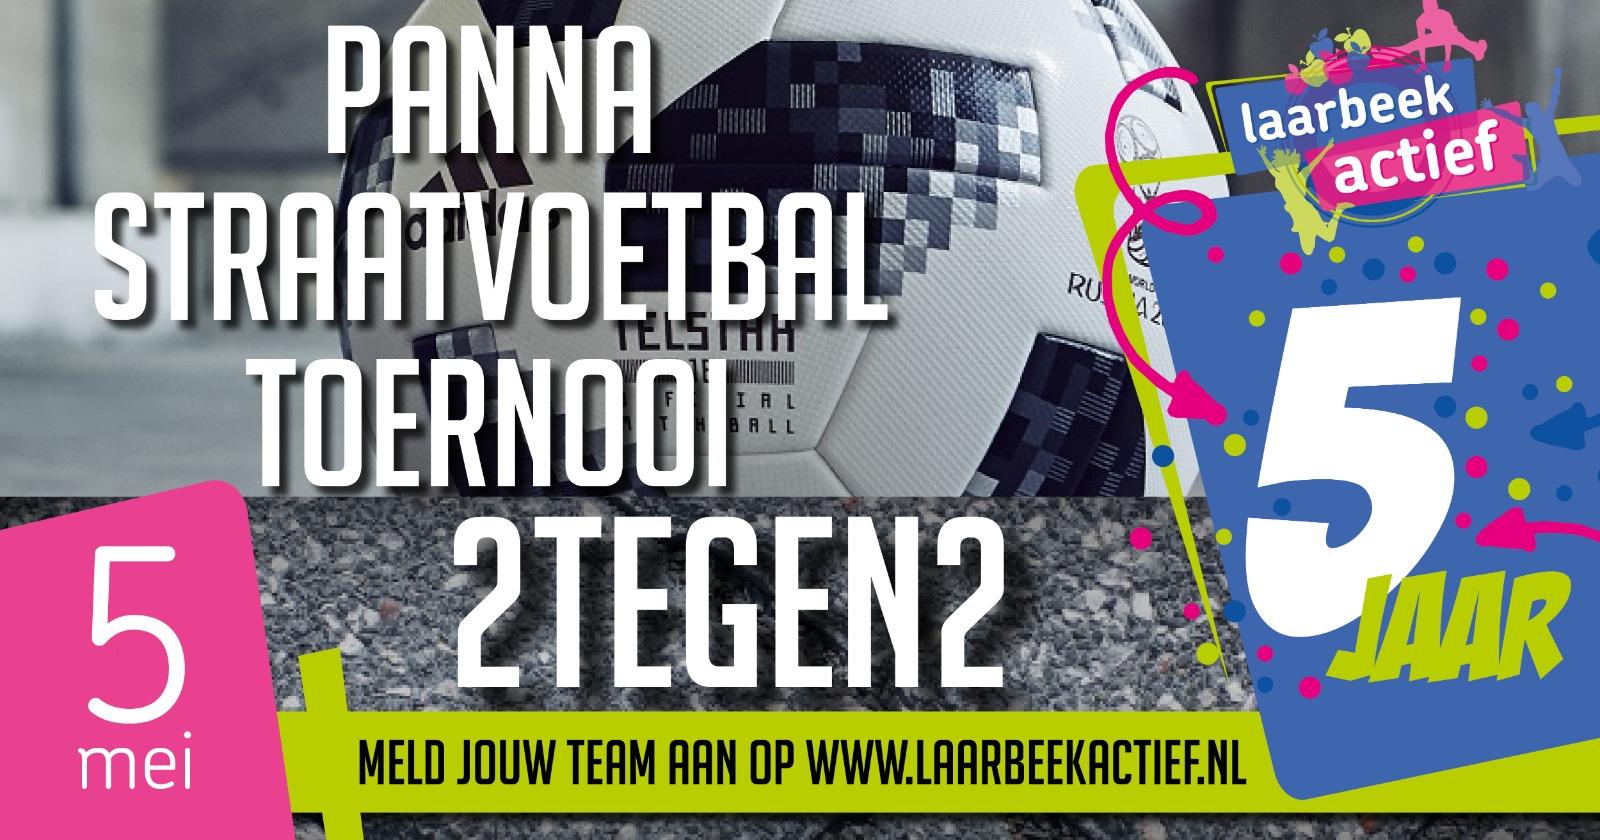 Panna-Straatvoetbal 2 vs 2 toernooi